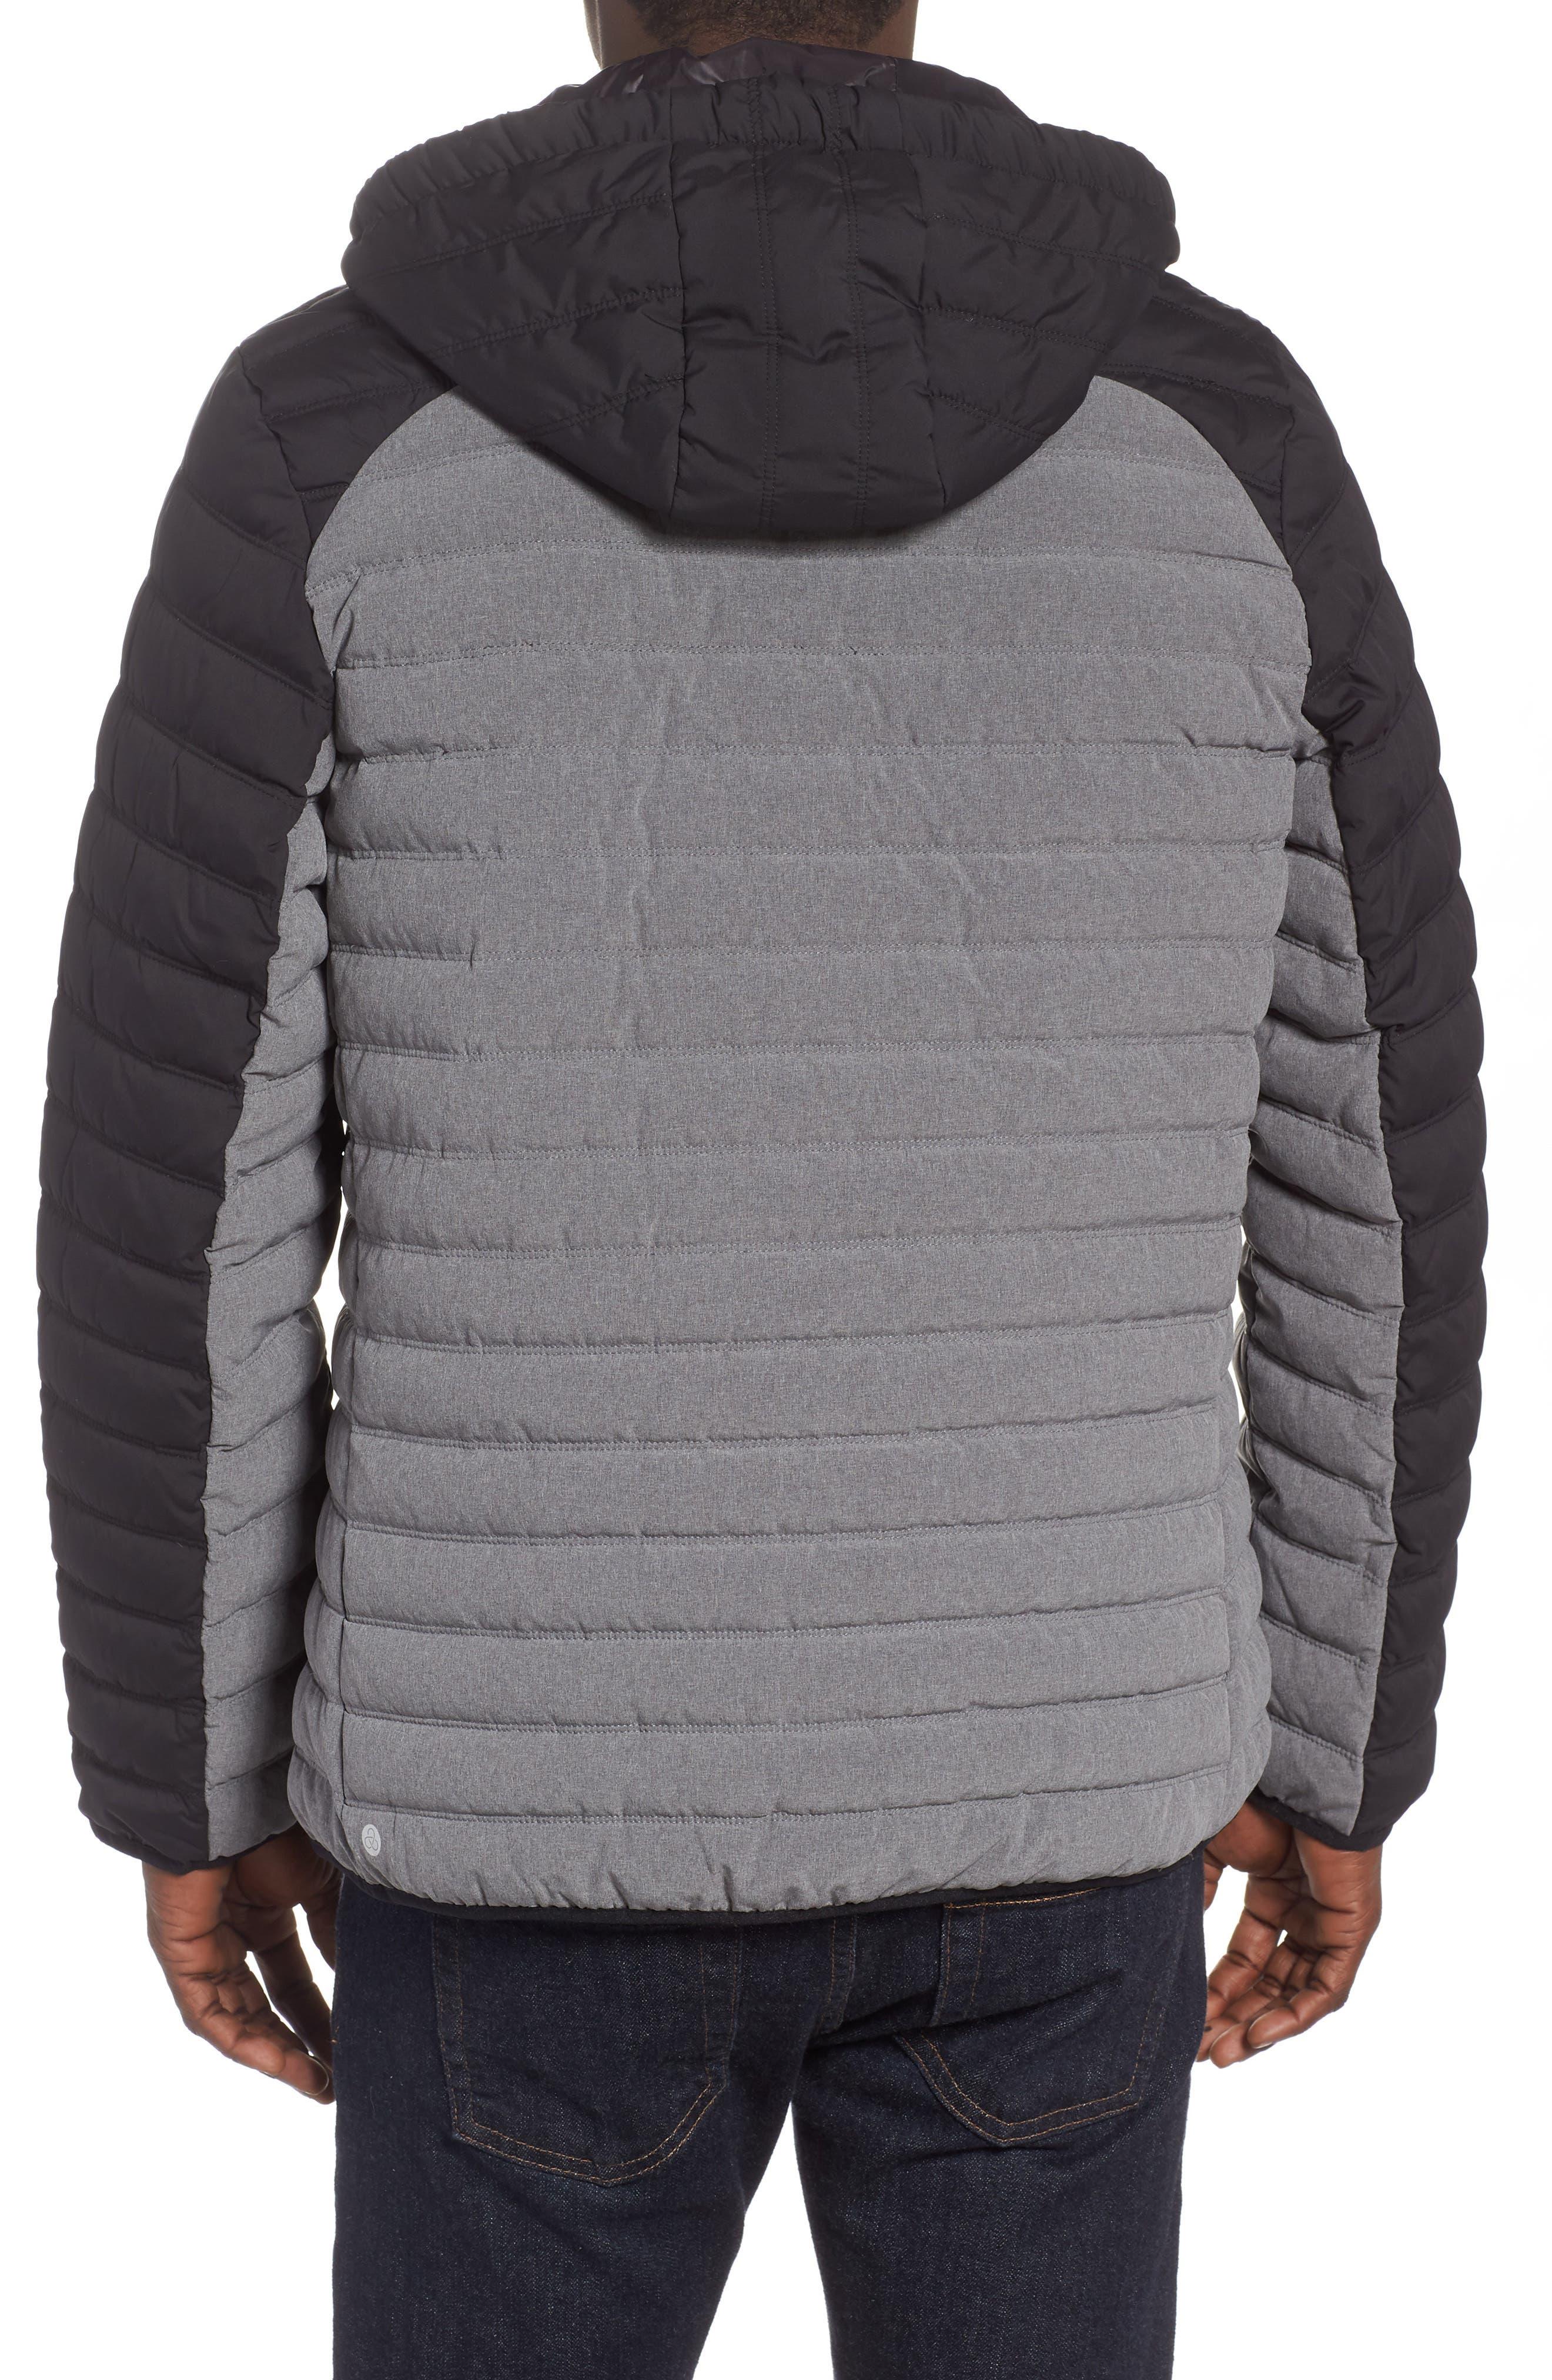 Hooded Water Resistant Down Jacket,                             Alternate thumbnail 2, color,                             BLACK GREY OBSIDIAN